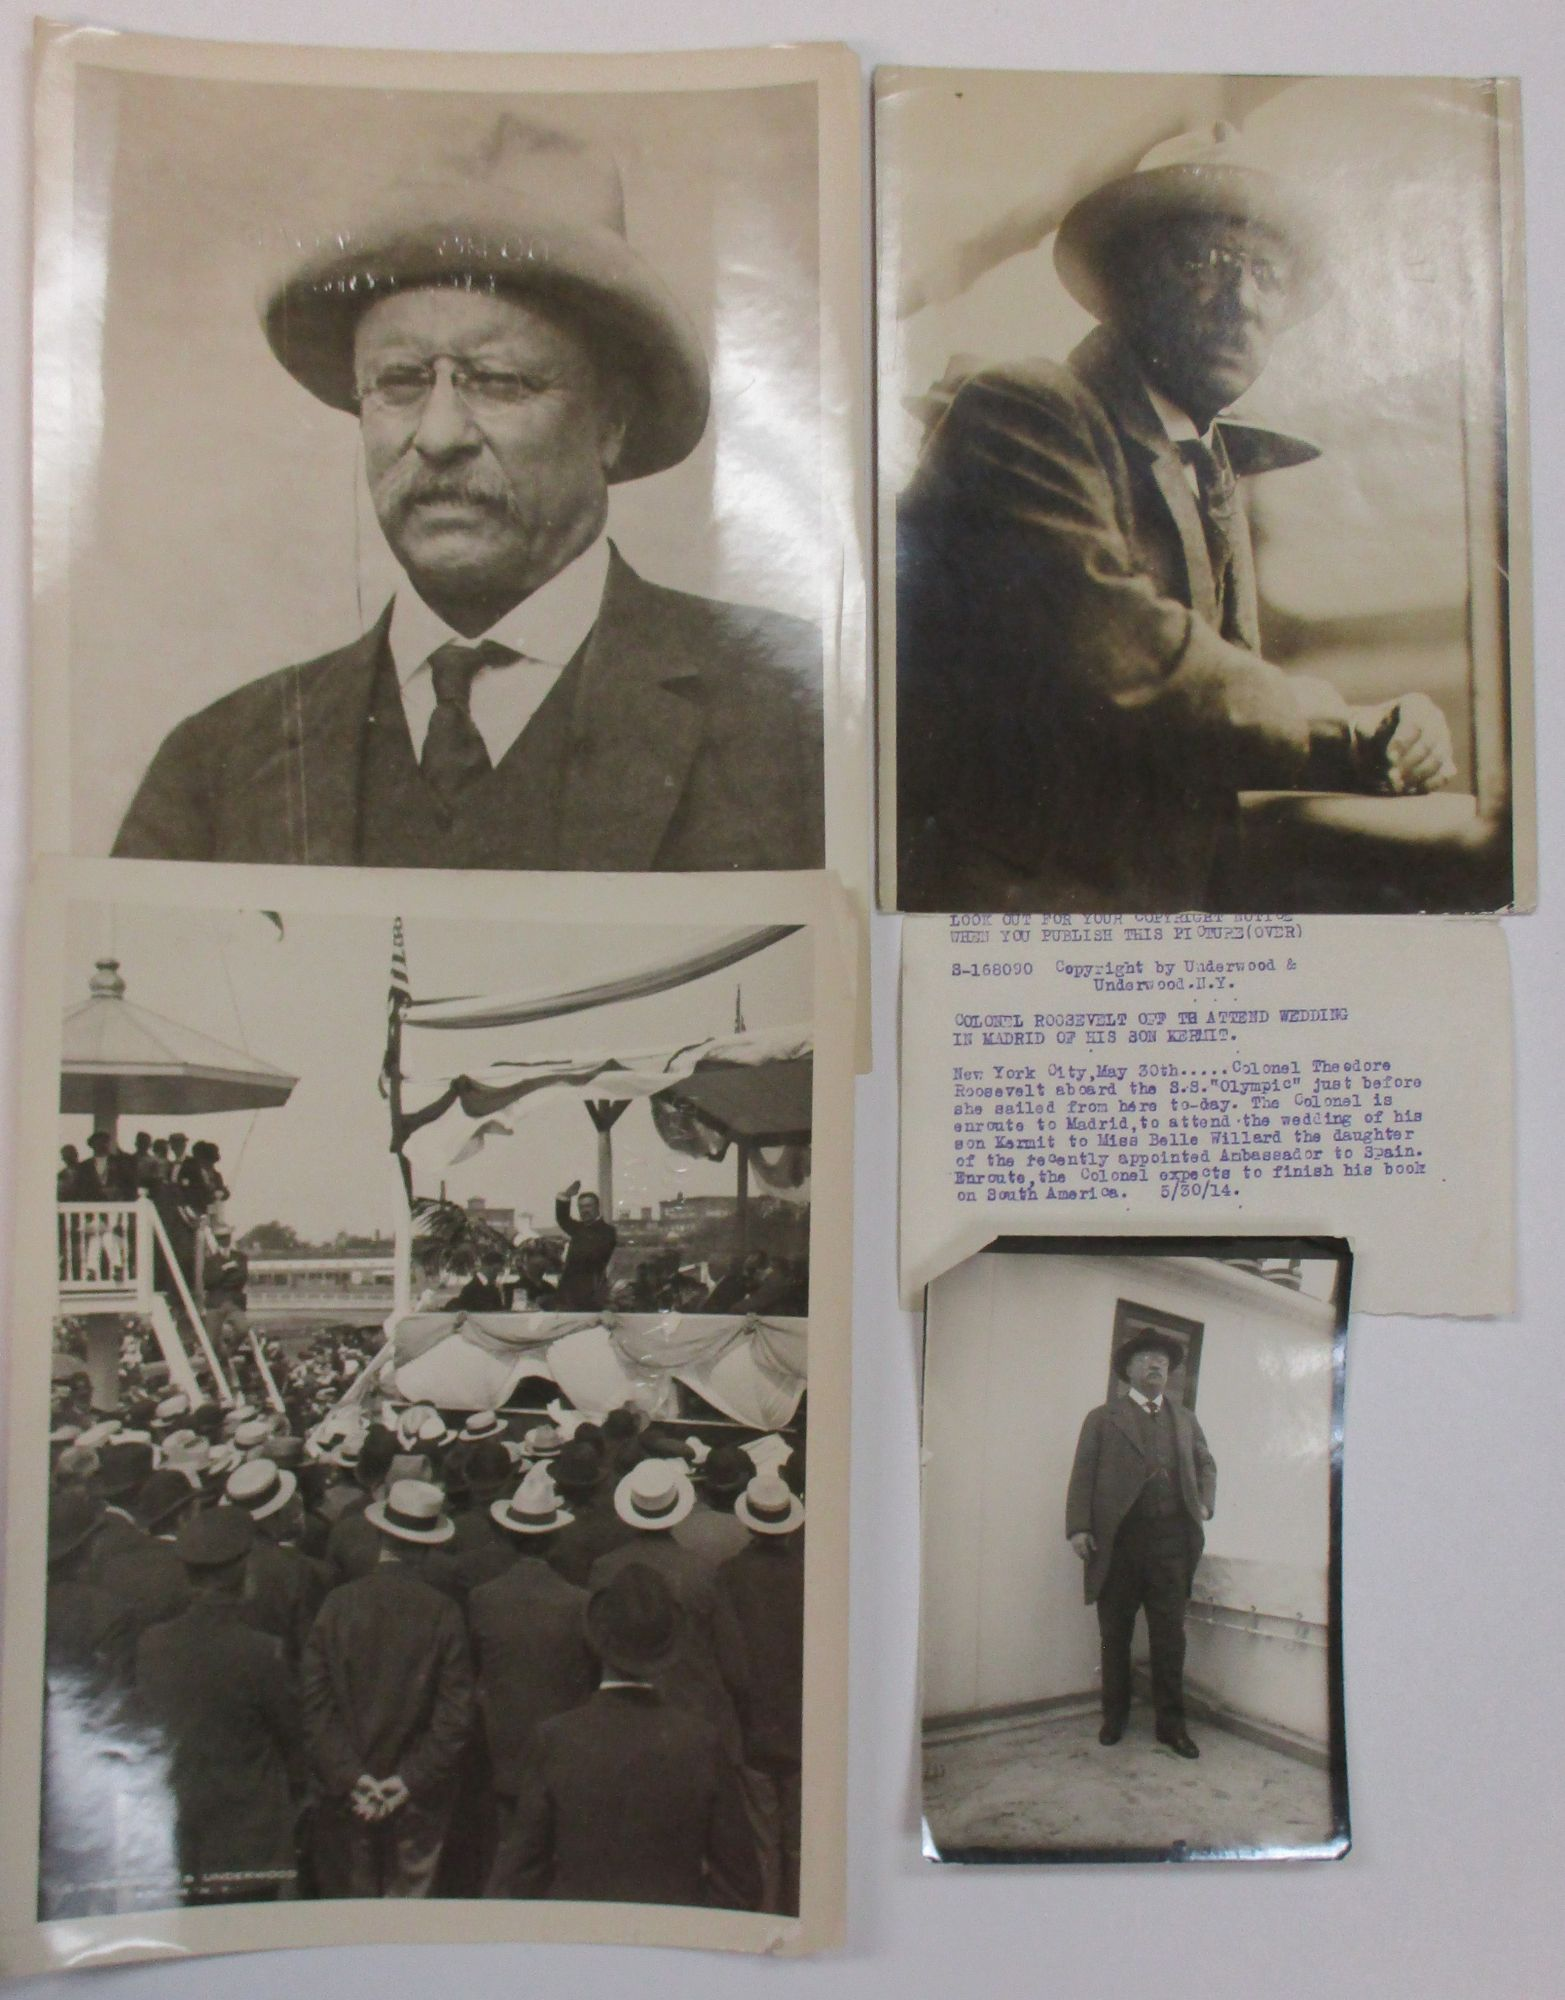 ARCHIVE OF THIRTEEN PRESS PHOTOGRAPHS OF THEODORE: Roosevelt, Theodore